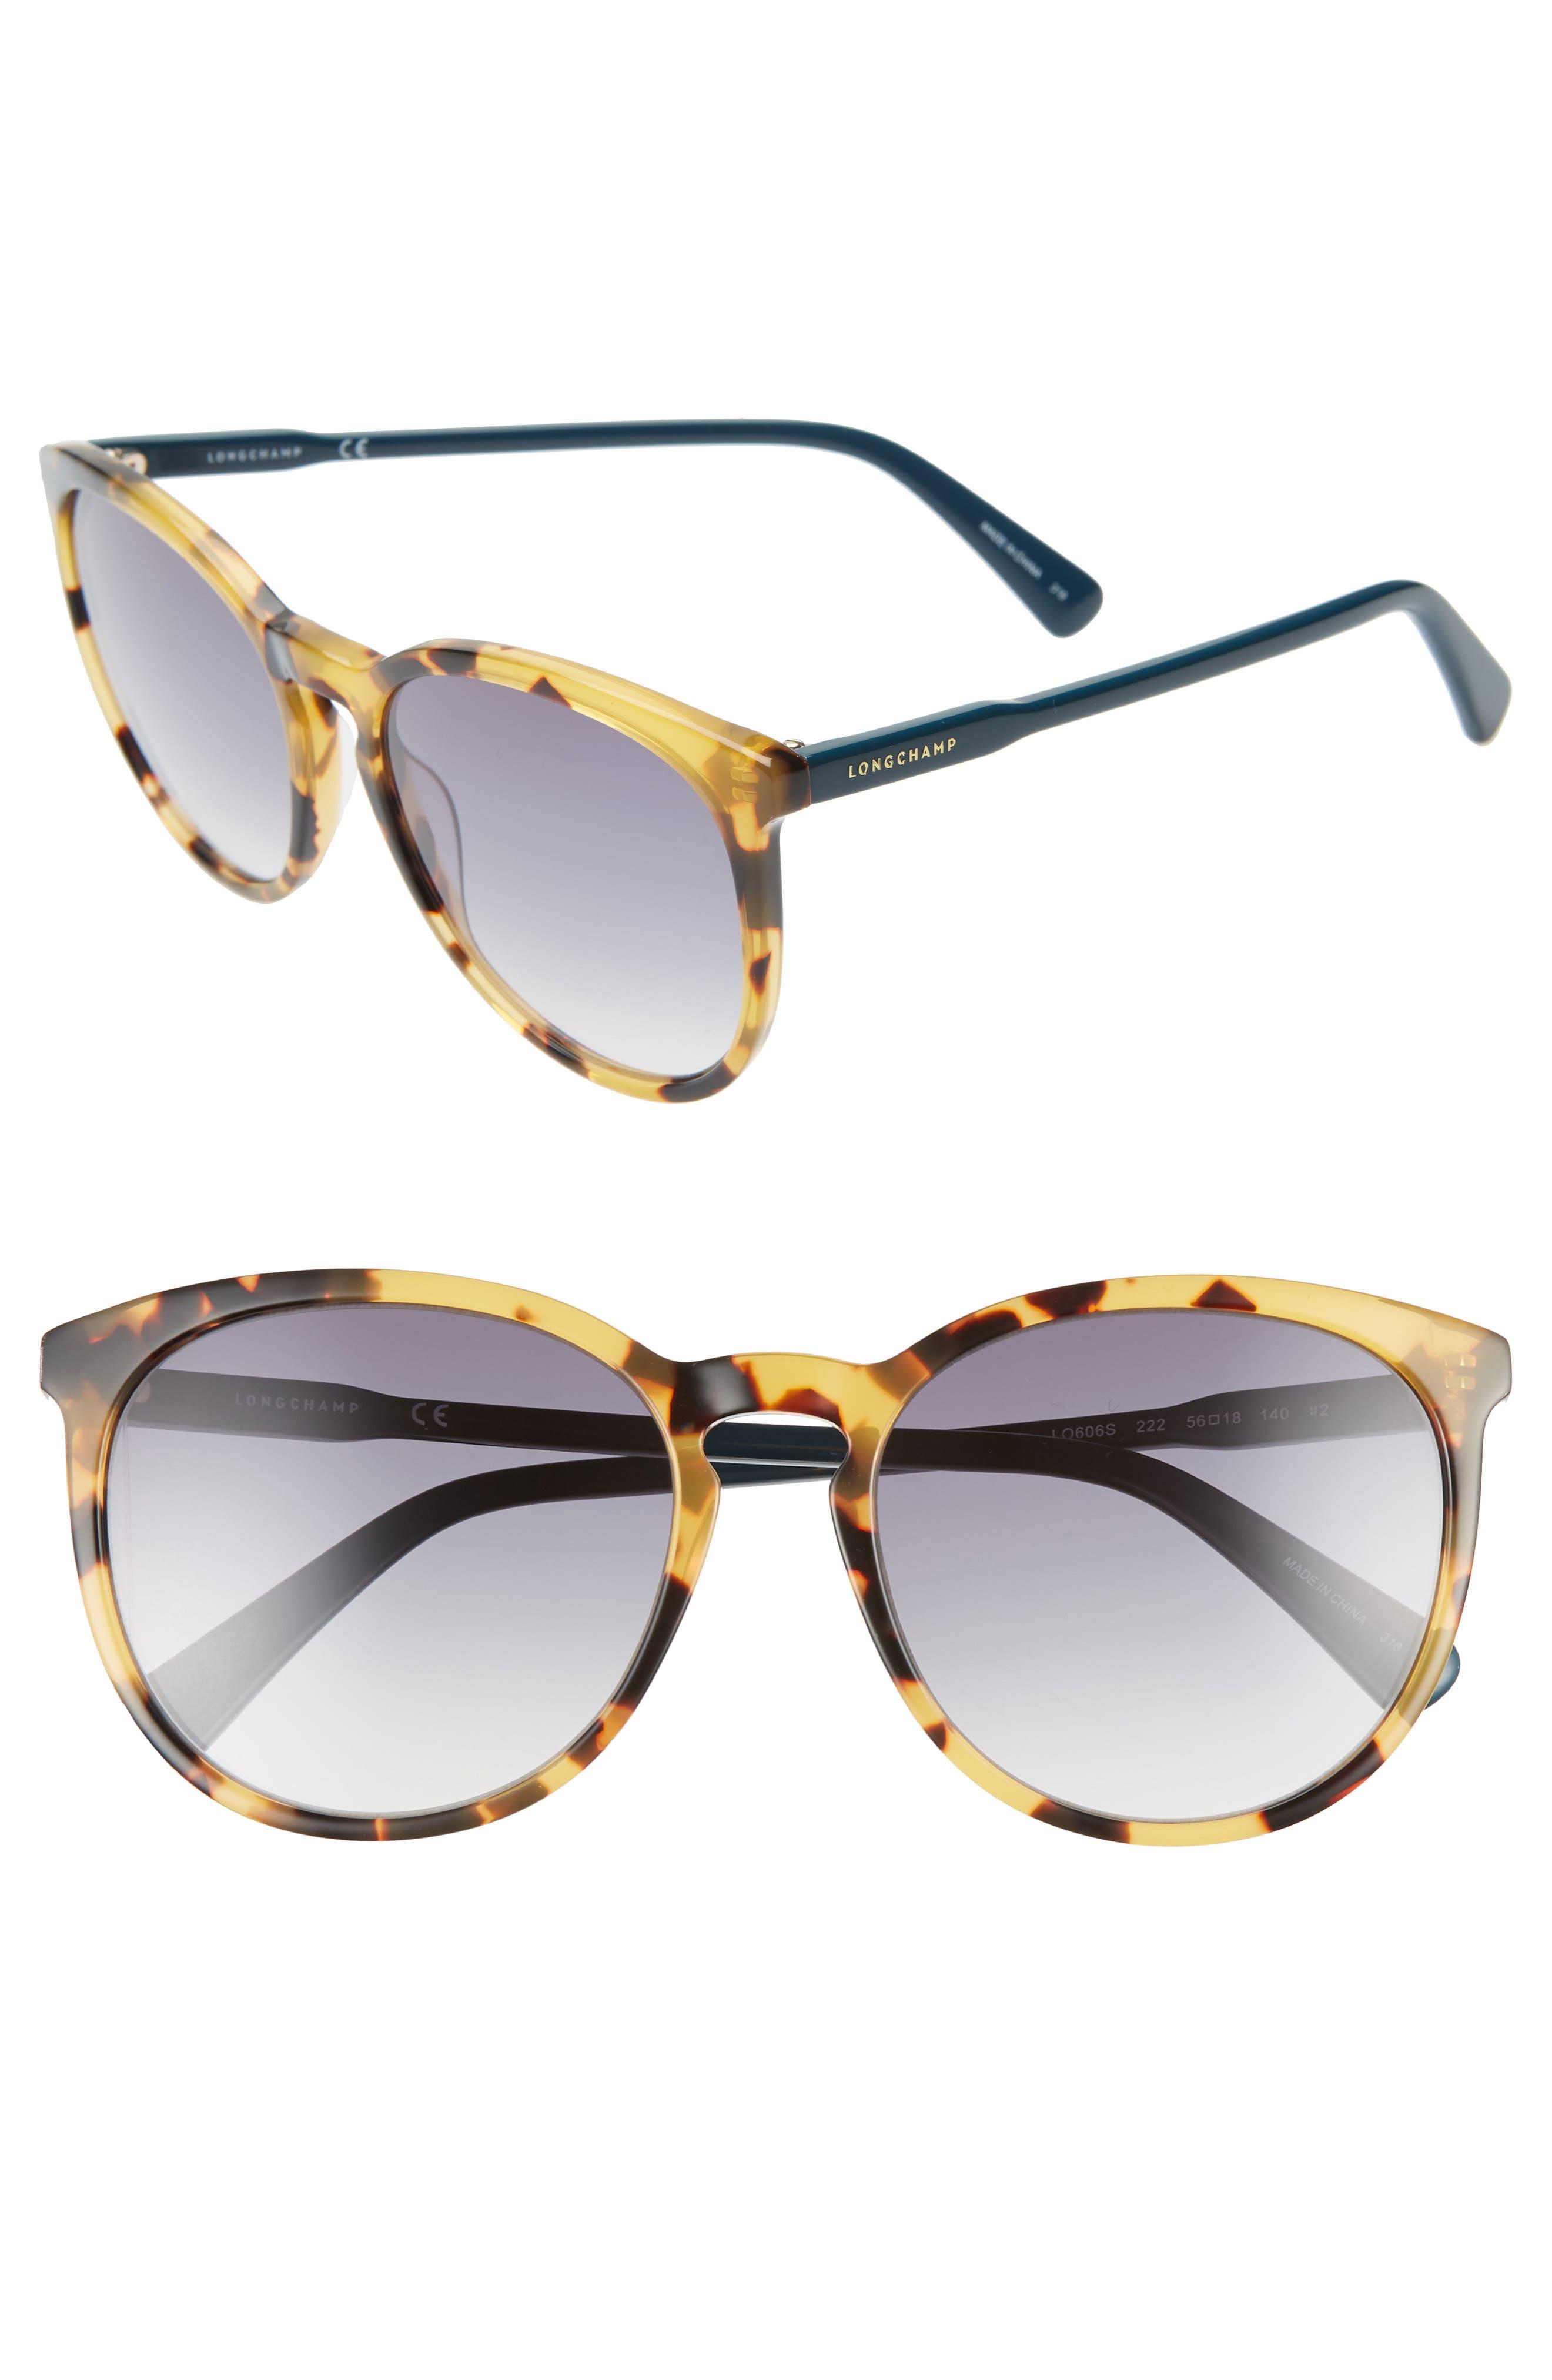 d3742c99b18 Longchamp Sunglasses for Women